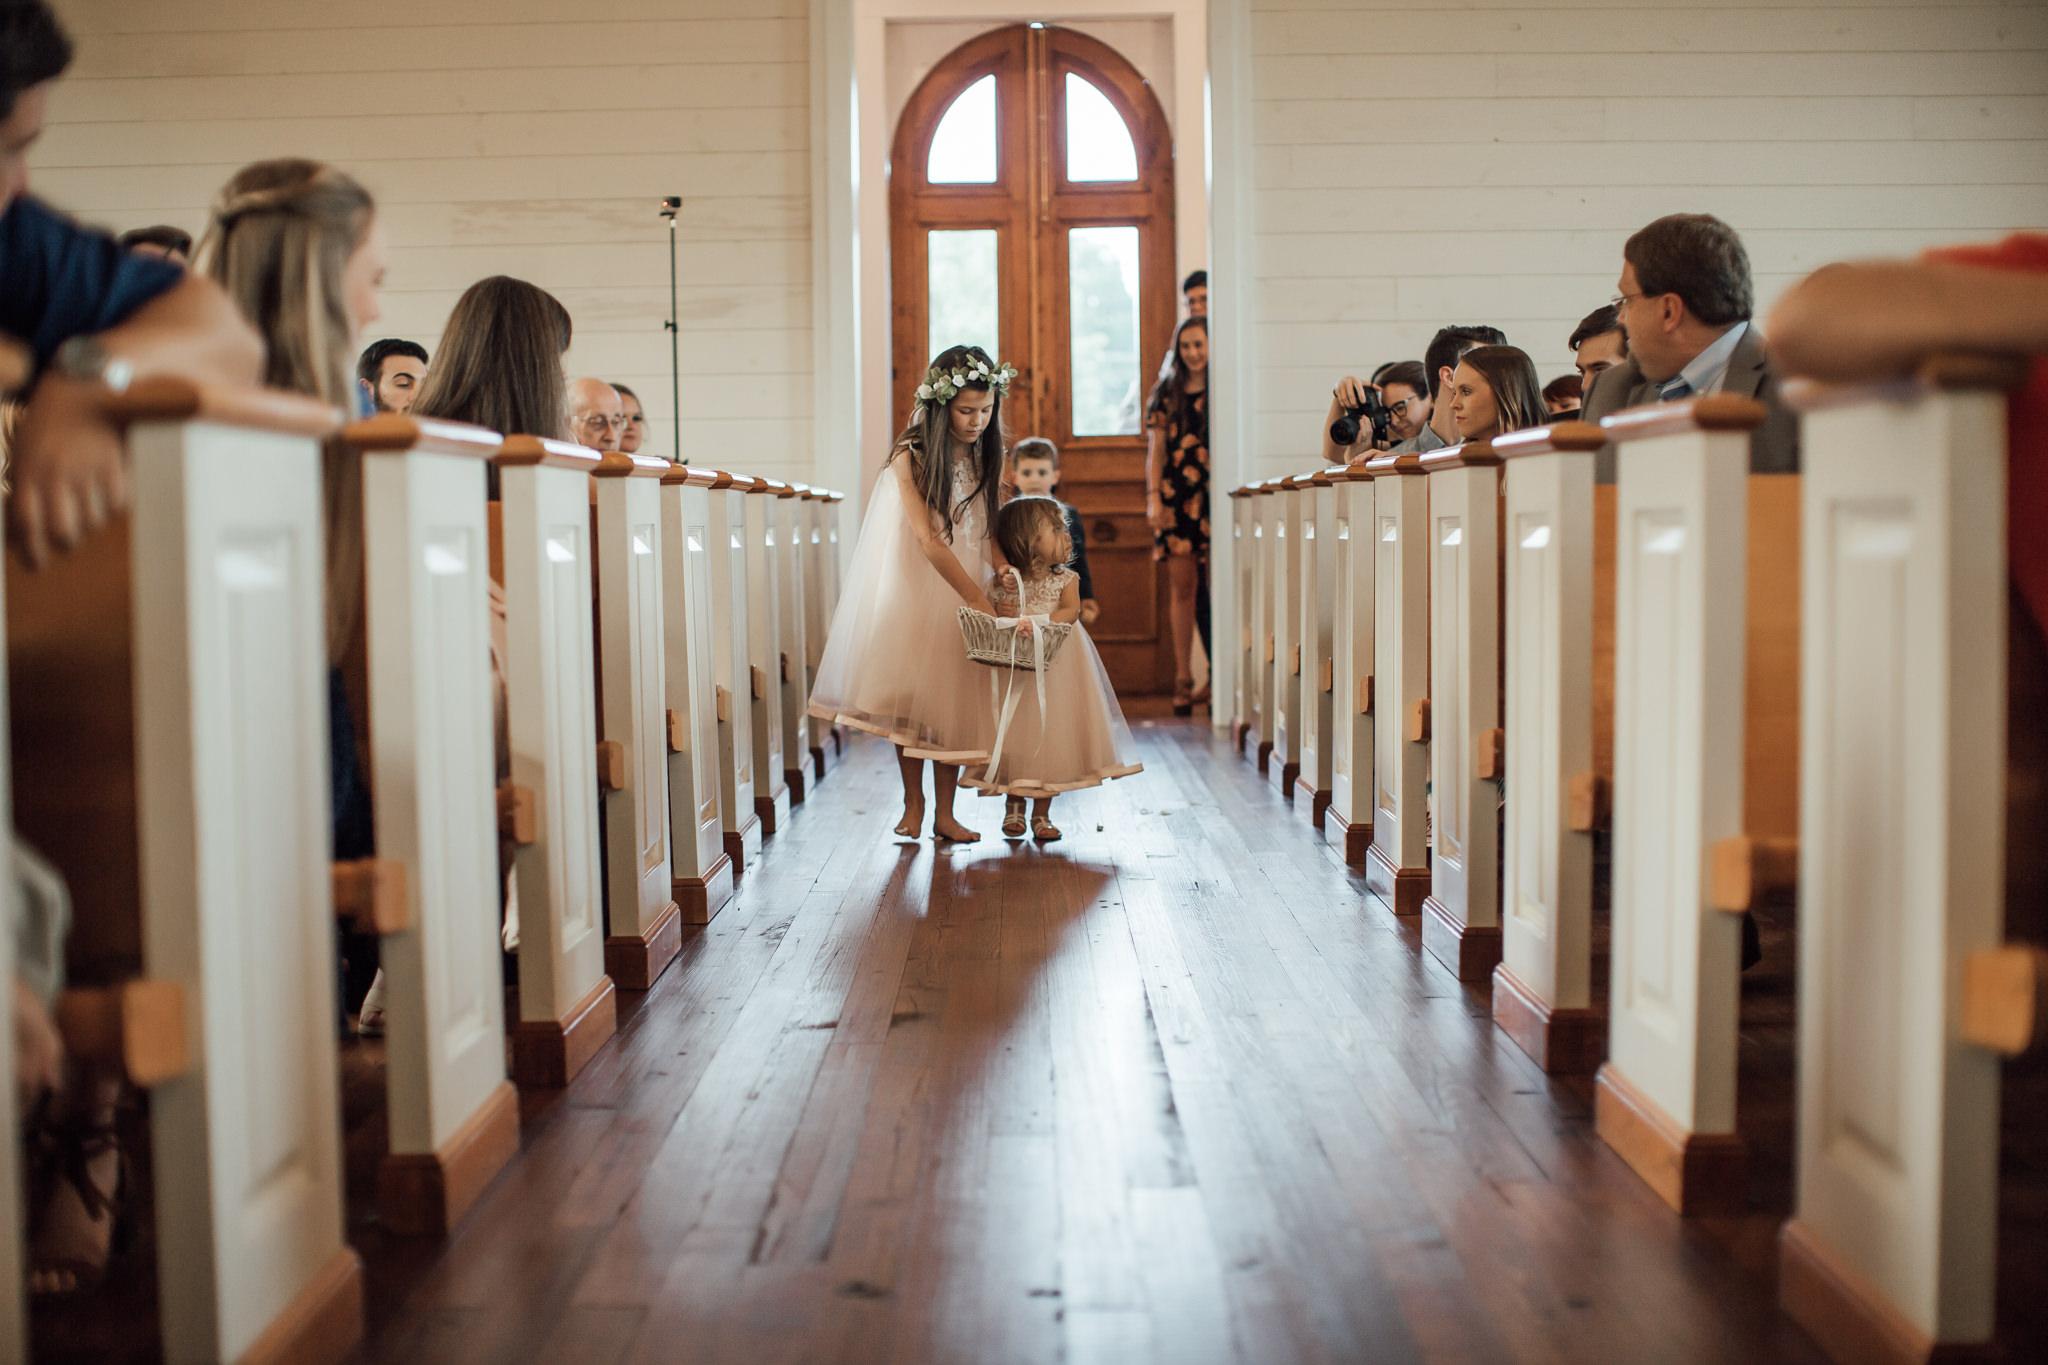 cassie-cook-photography-memphis-wedding-photographer-hedge-farm-wedding-venue-215.jpg